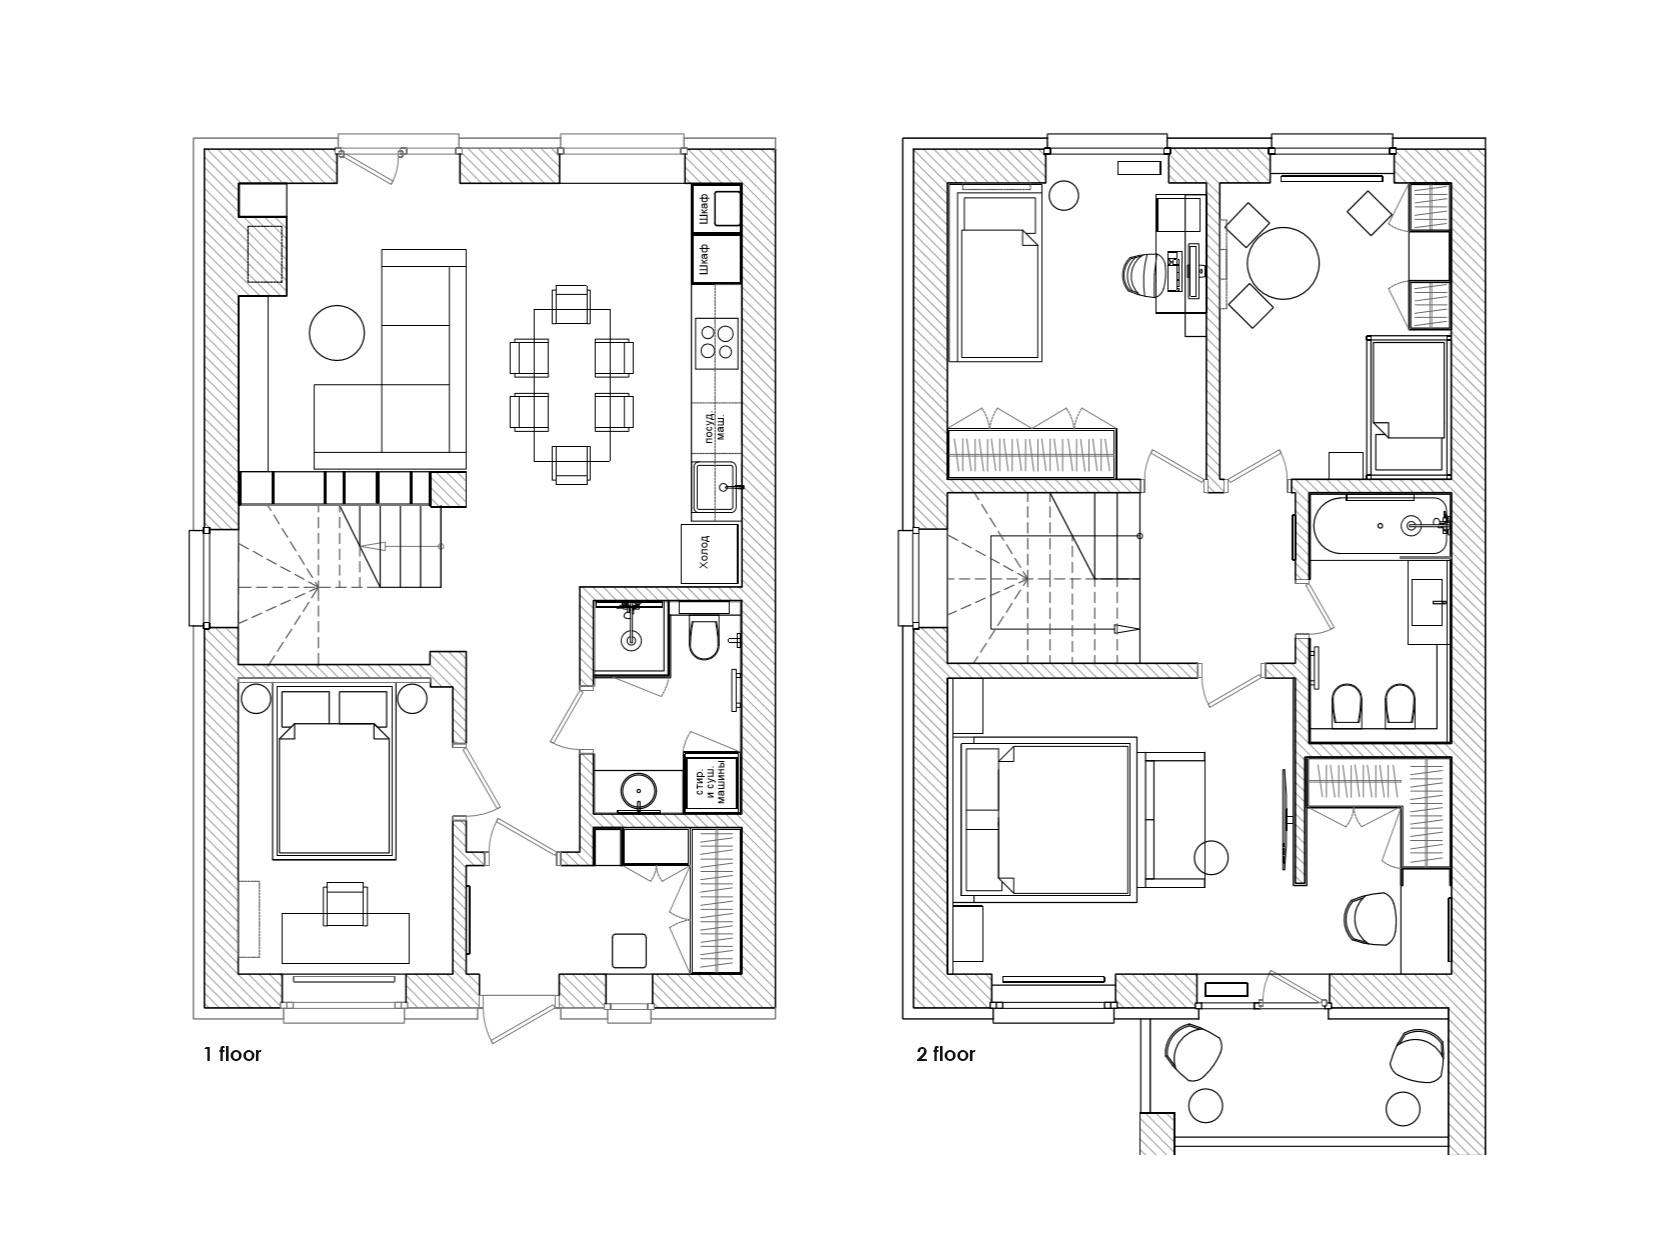 duplex_irpen_azari-architects-com.jpg